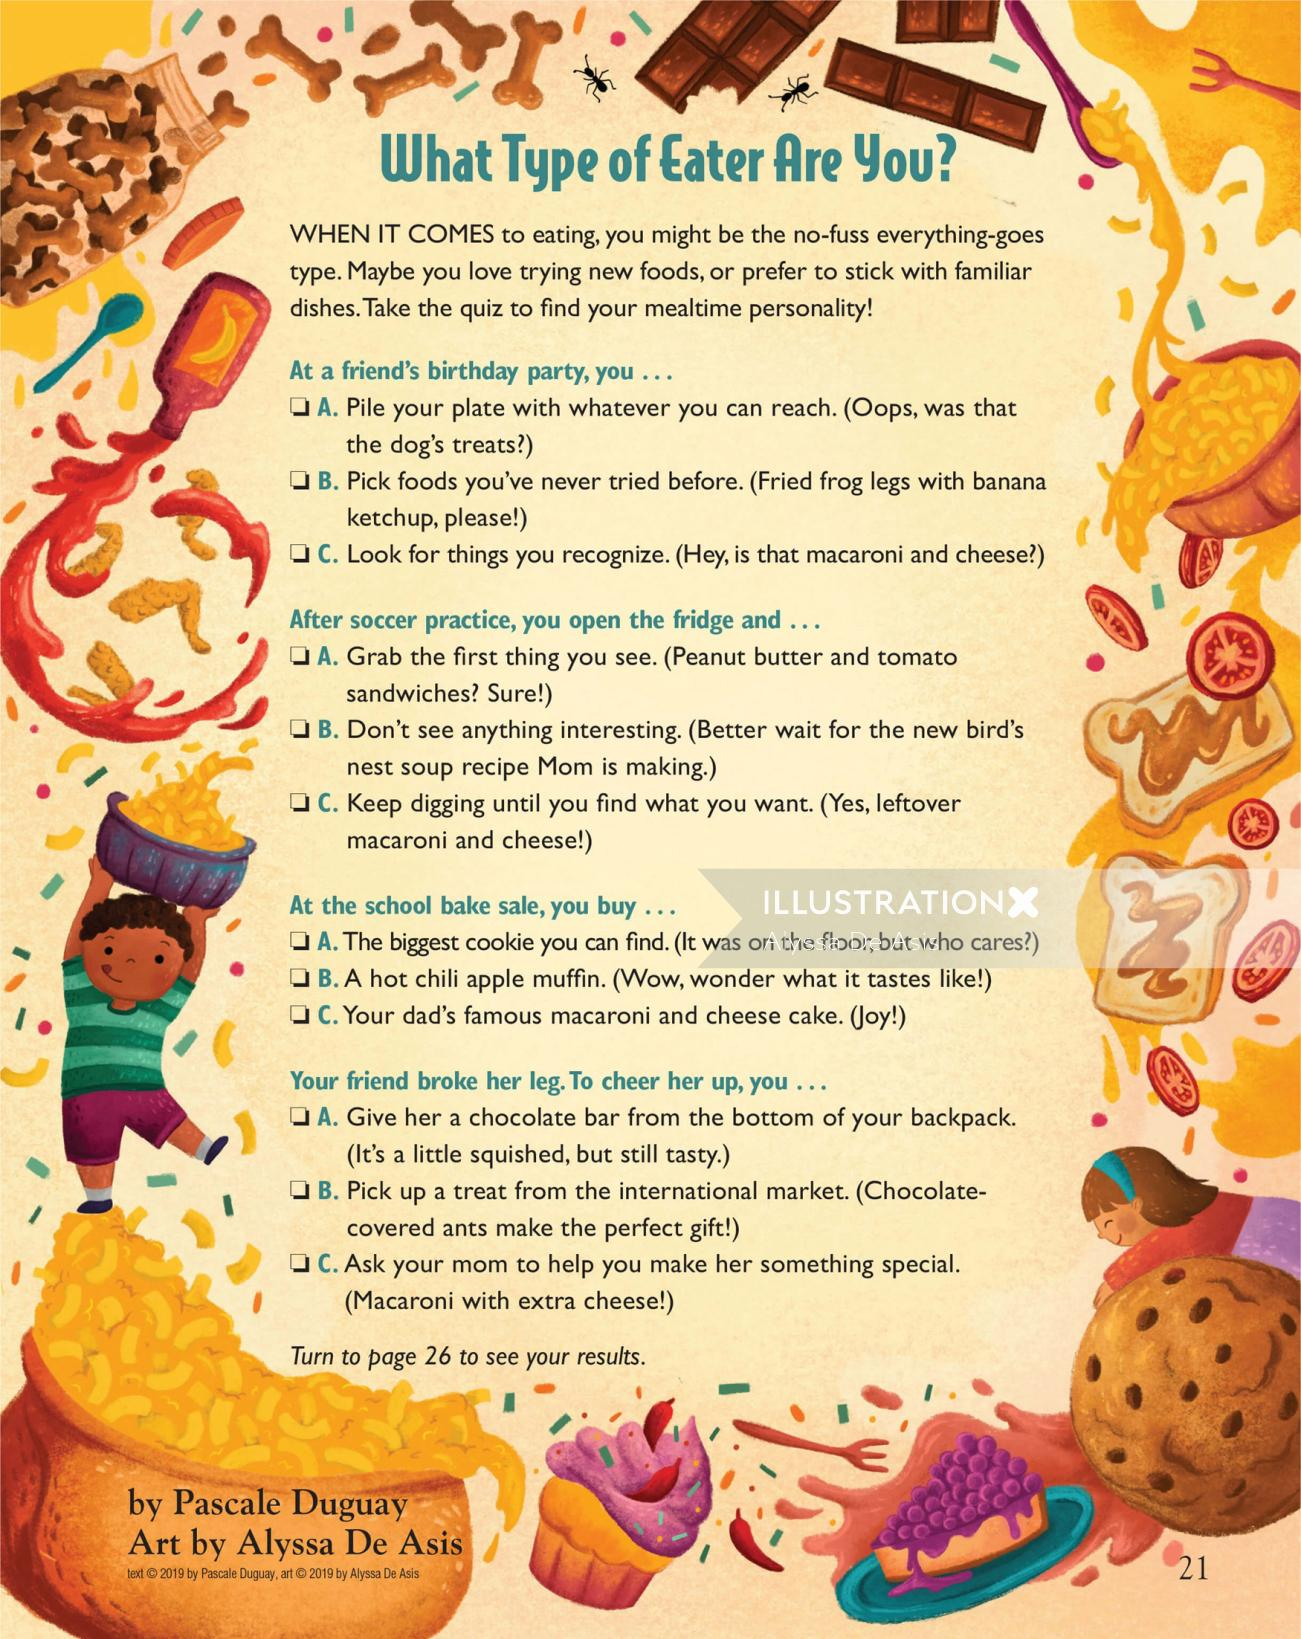 decorative illustration of eating habits quiz